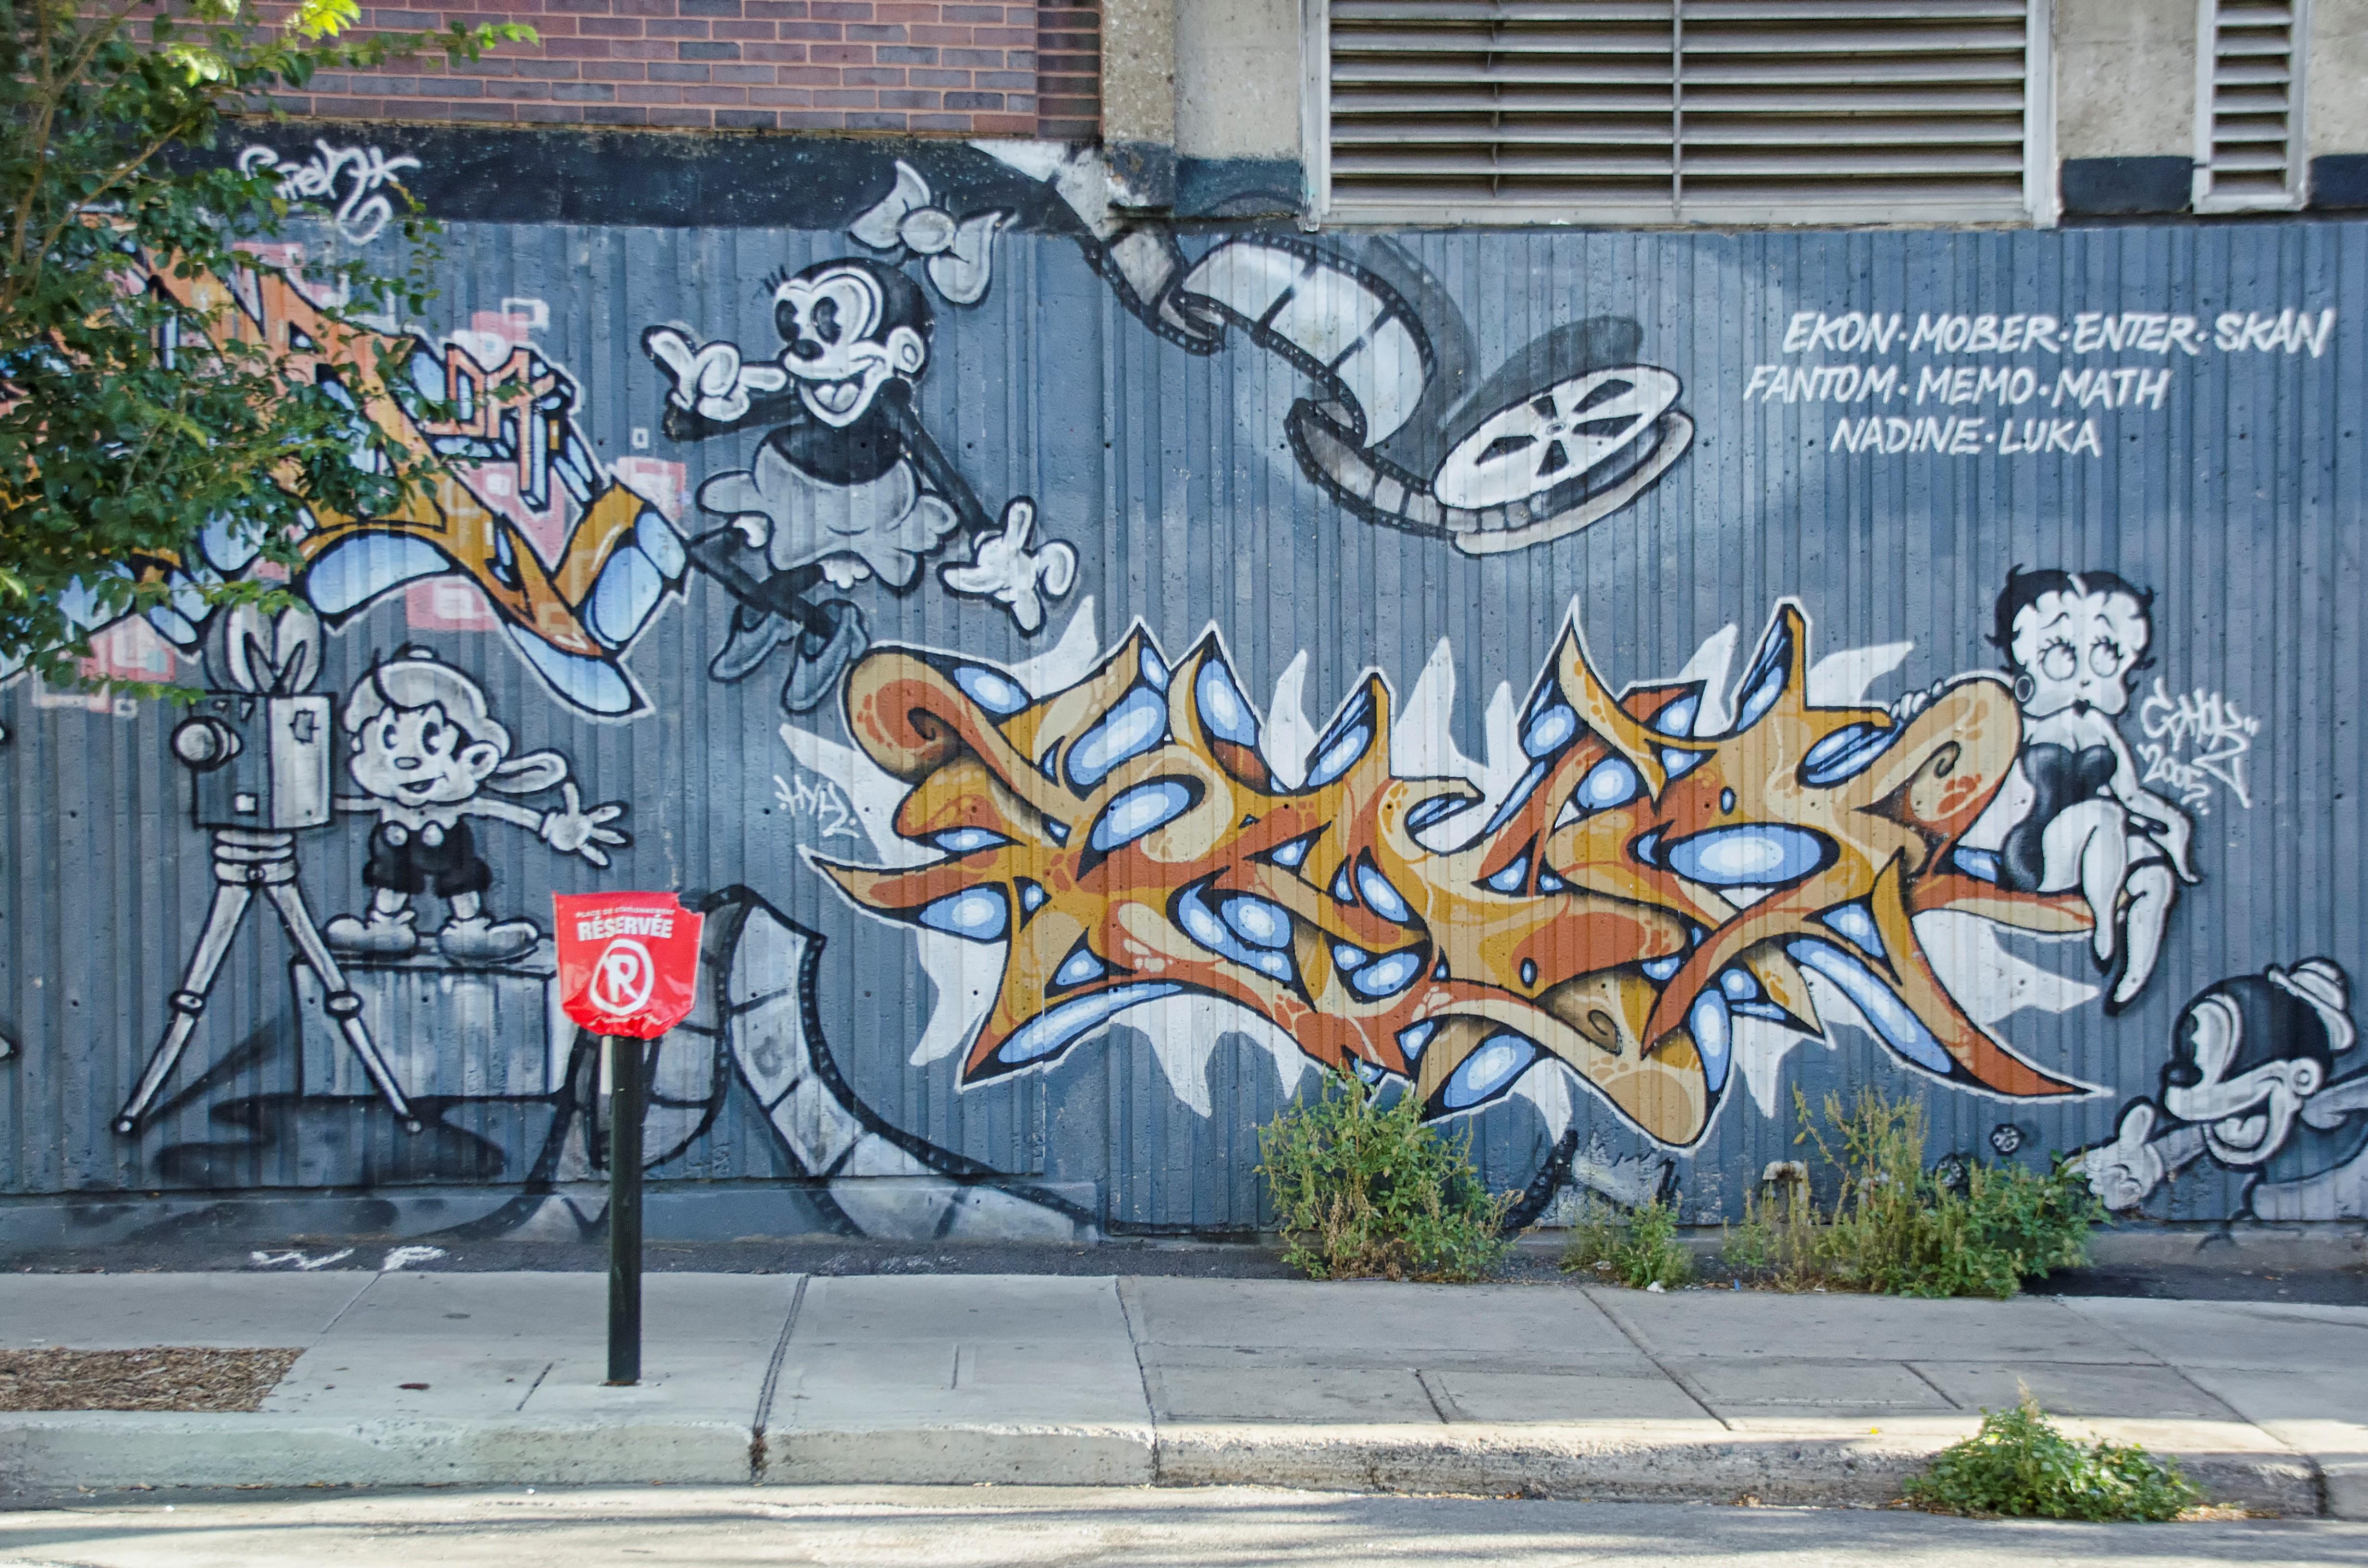 Free Images Road City Wall Graffiti Street Art De Of Canada